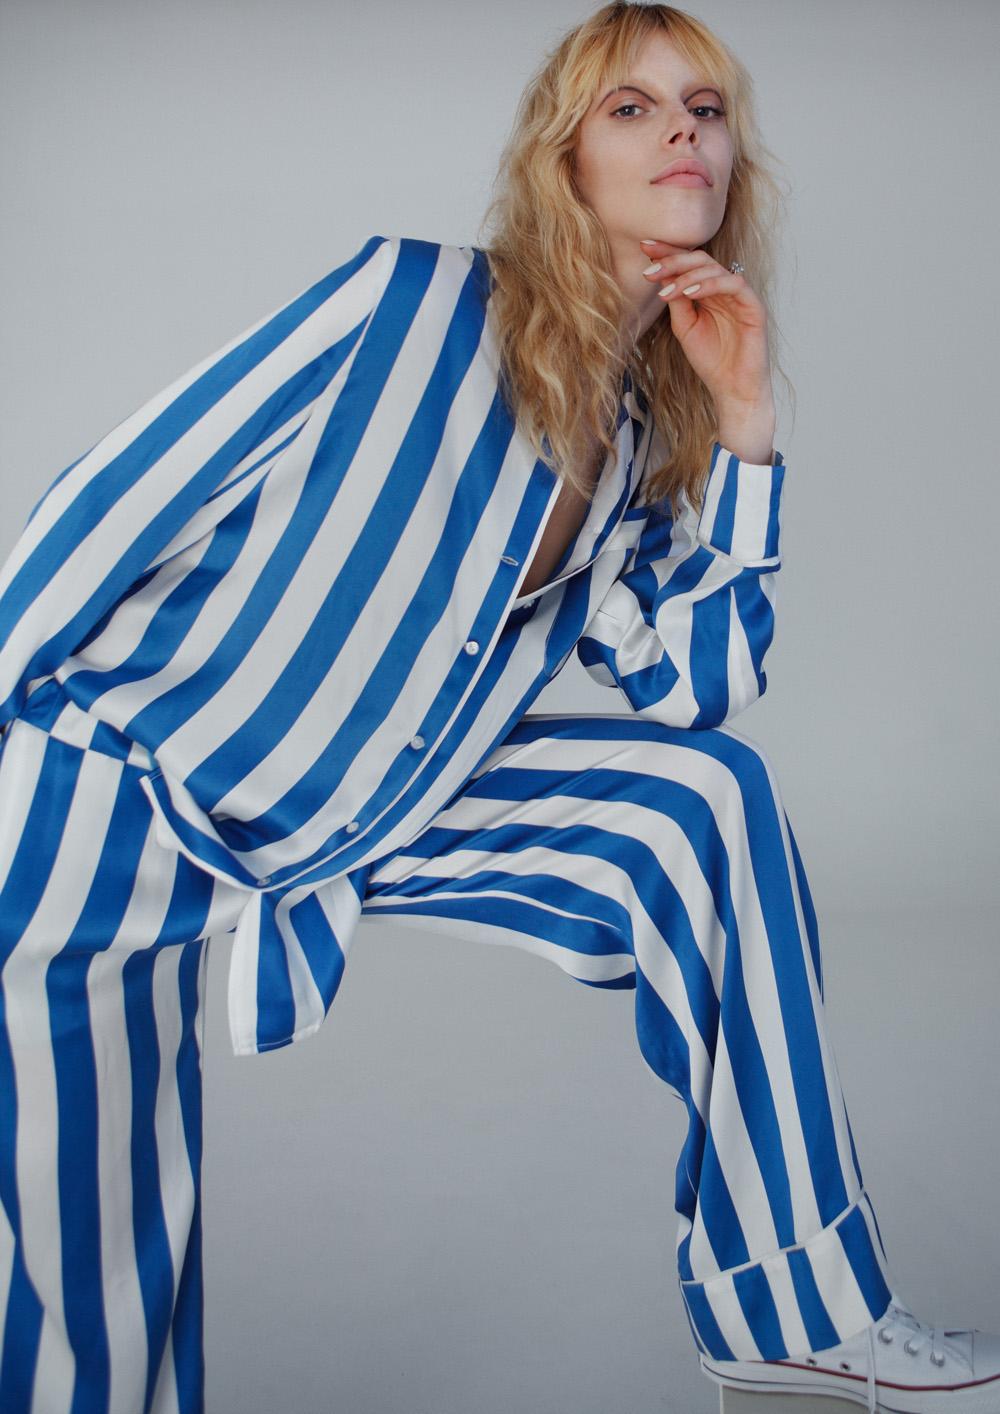 pyjama trend 17.eilika-meckbach-romain-duquesne-oyster-pyjama-trend-oracle-fox